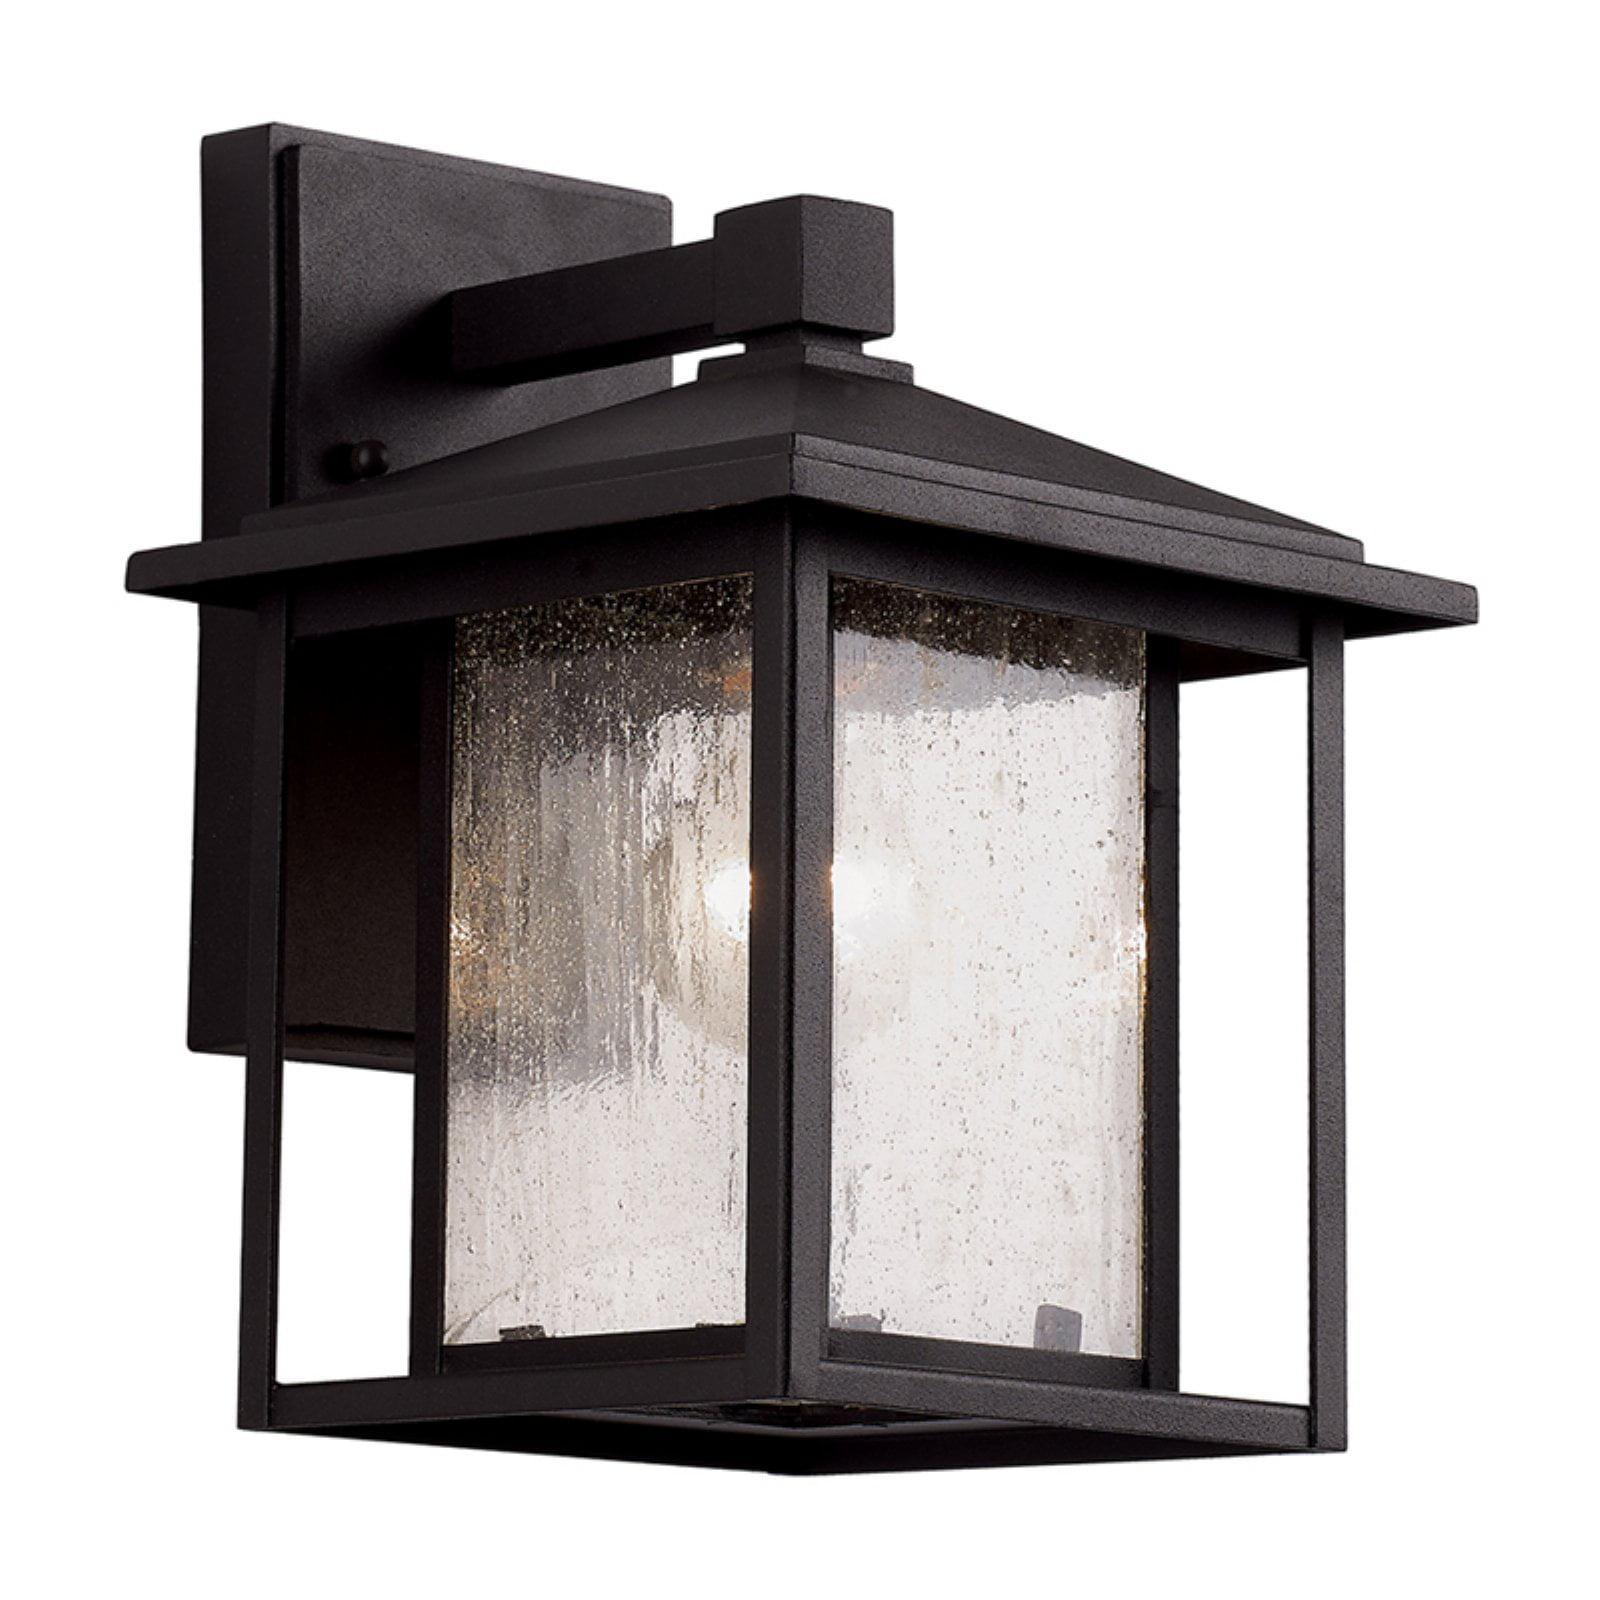 Trans Globe Lighting 40360 Patio Window Outdoor Wall Lantern